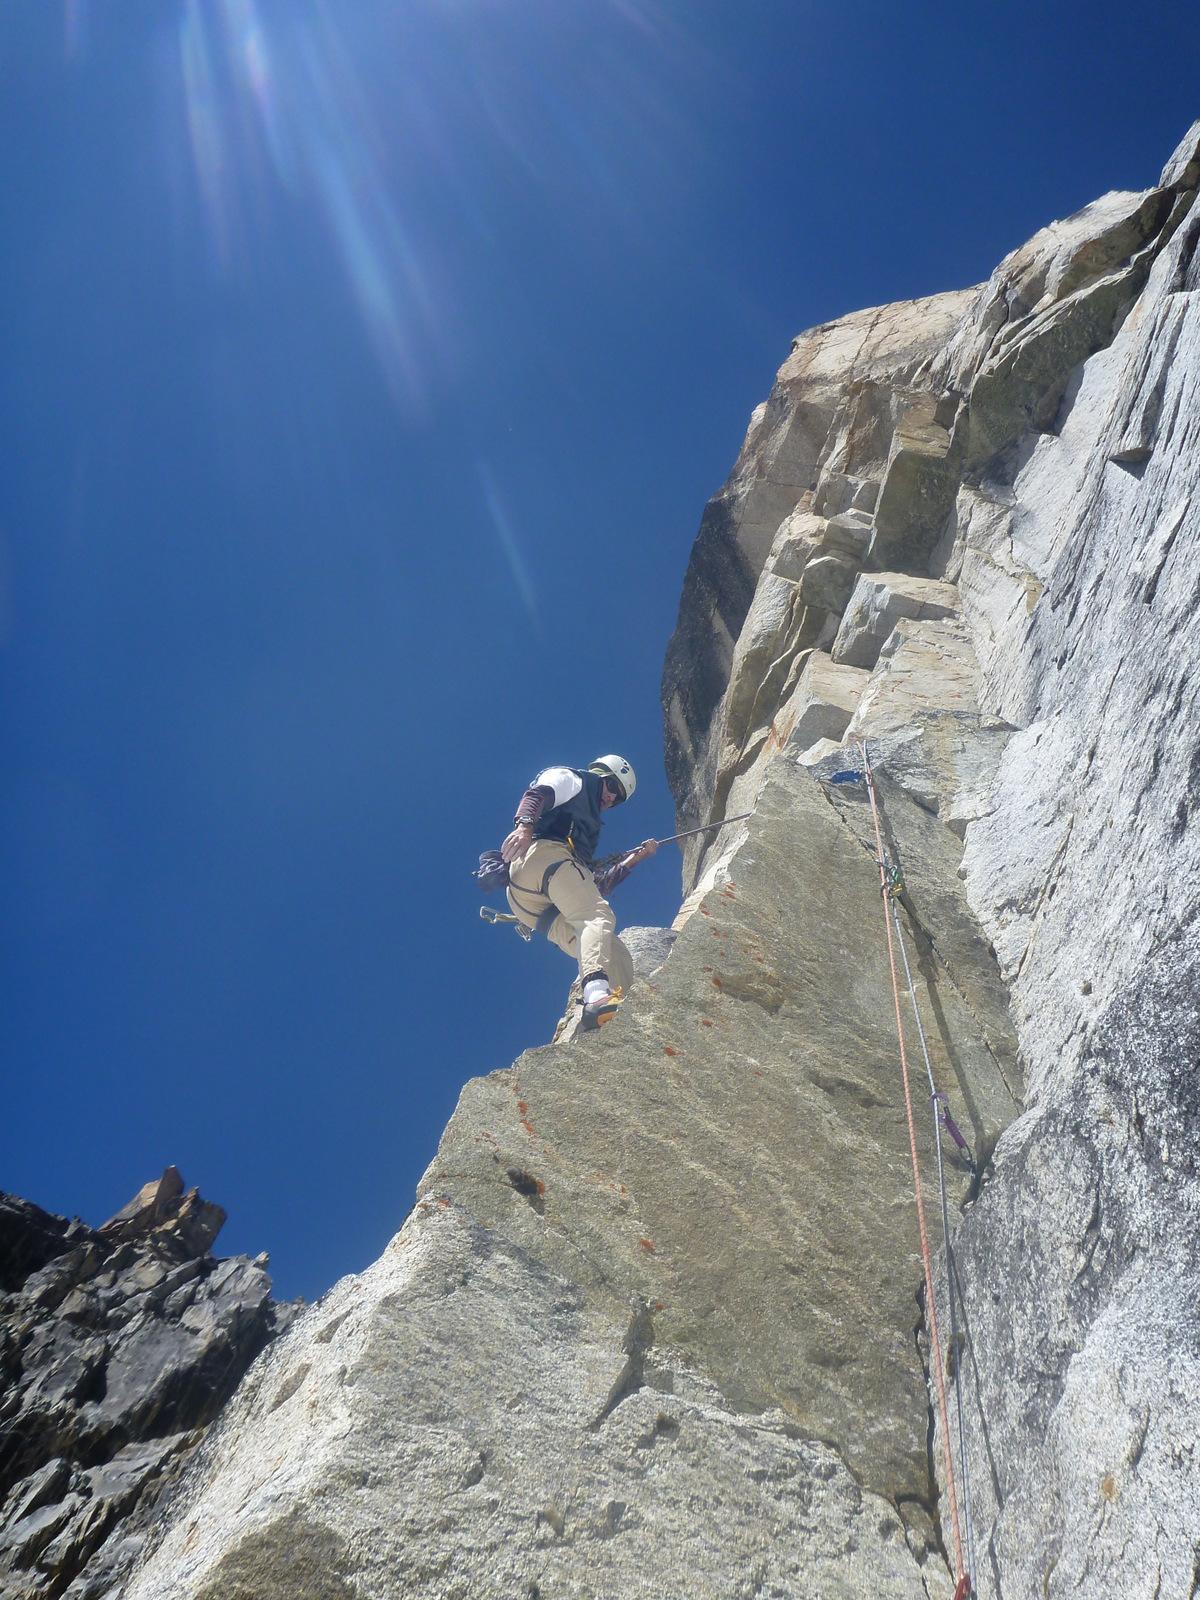 Granit & climber